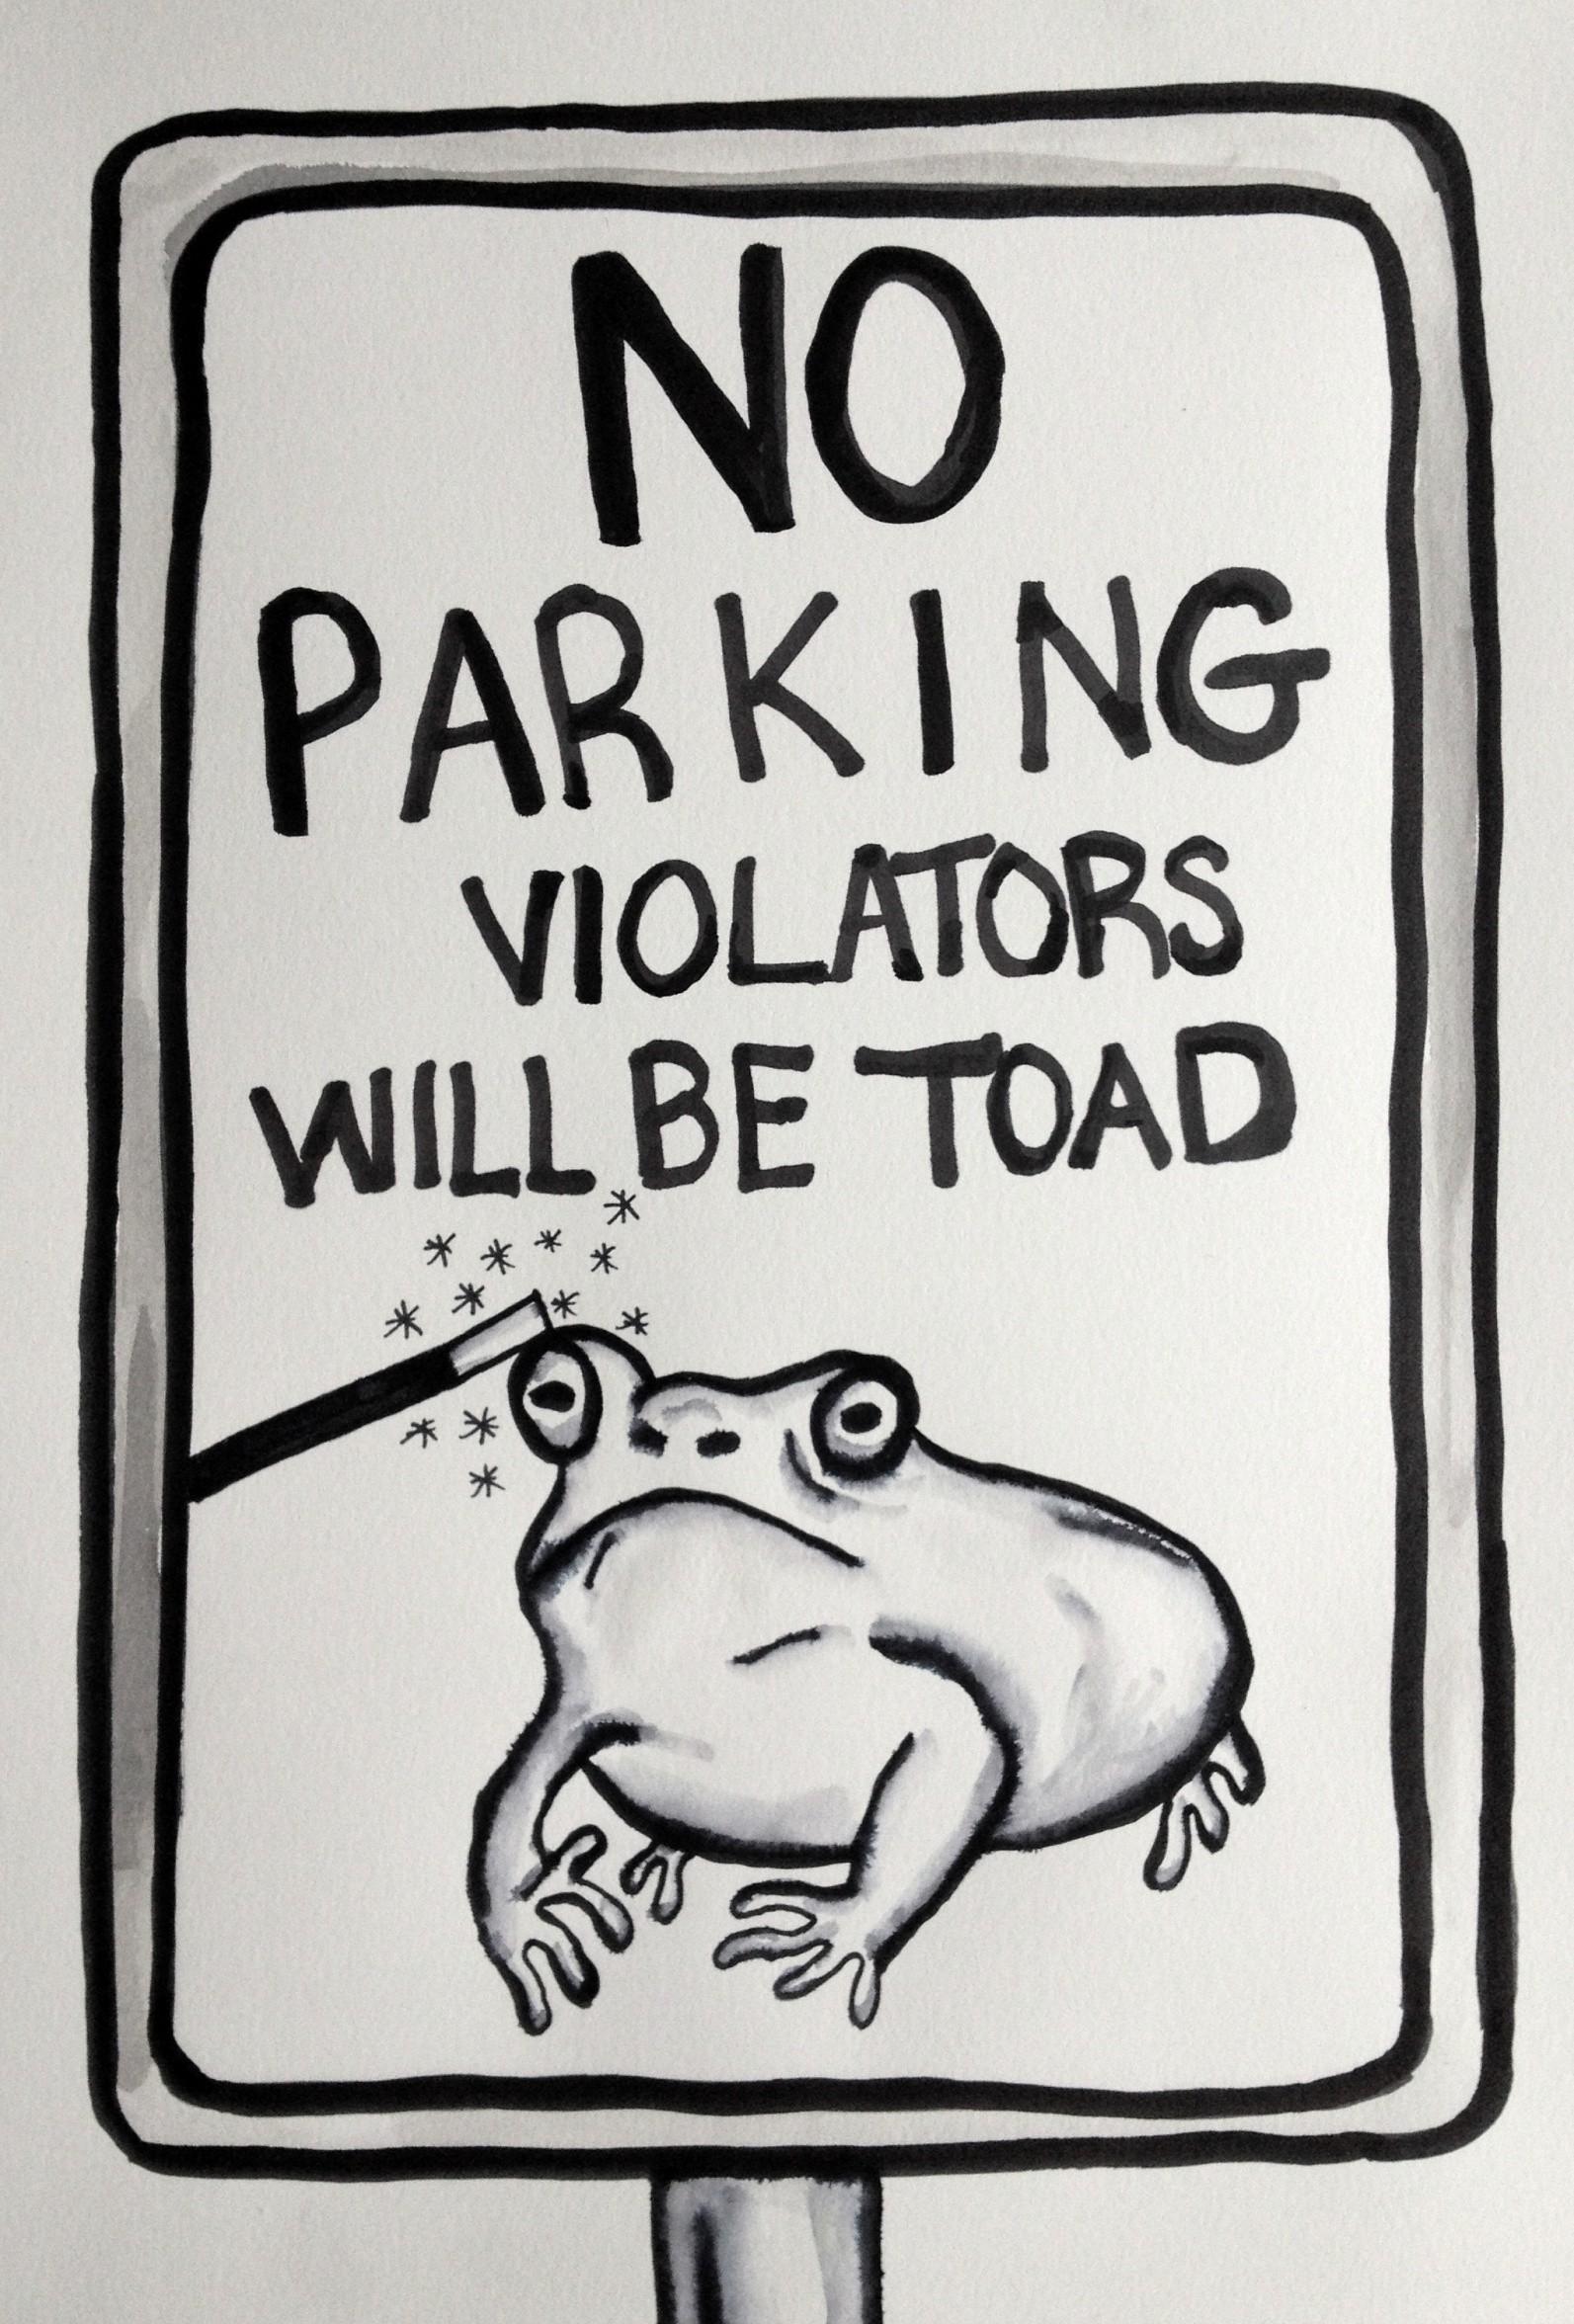 Vilators will be toad